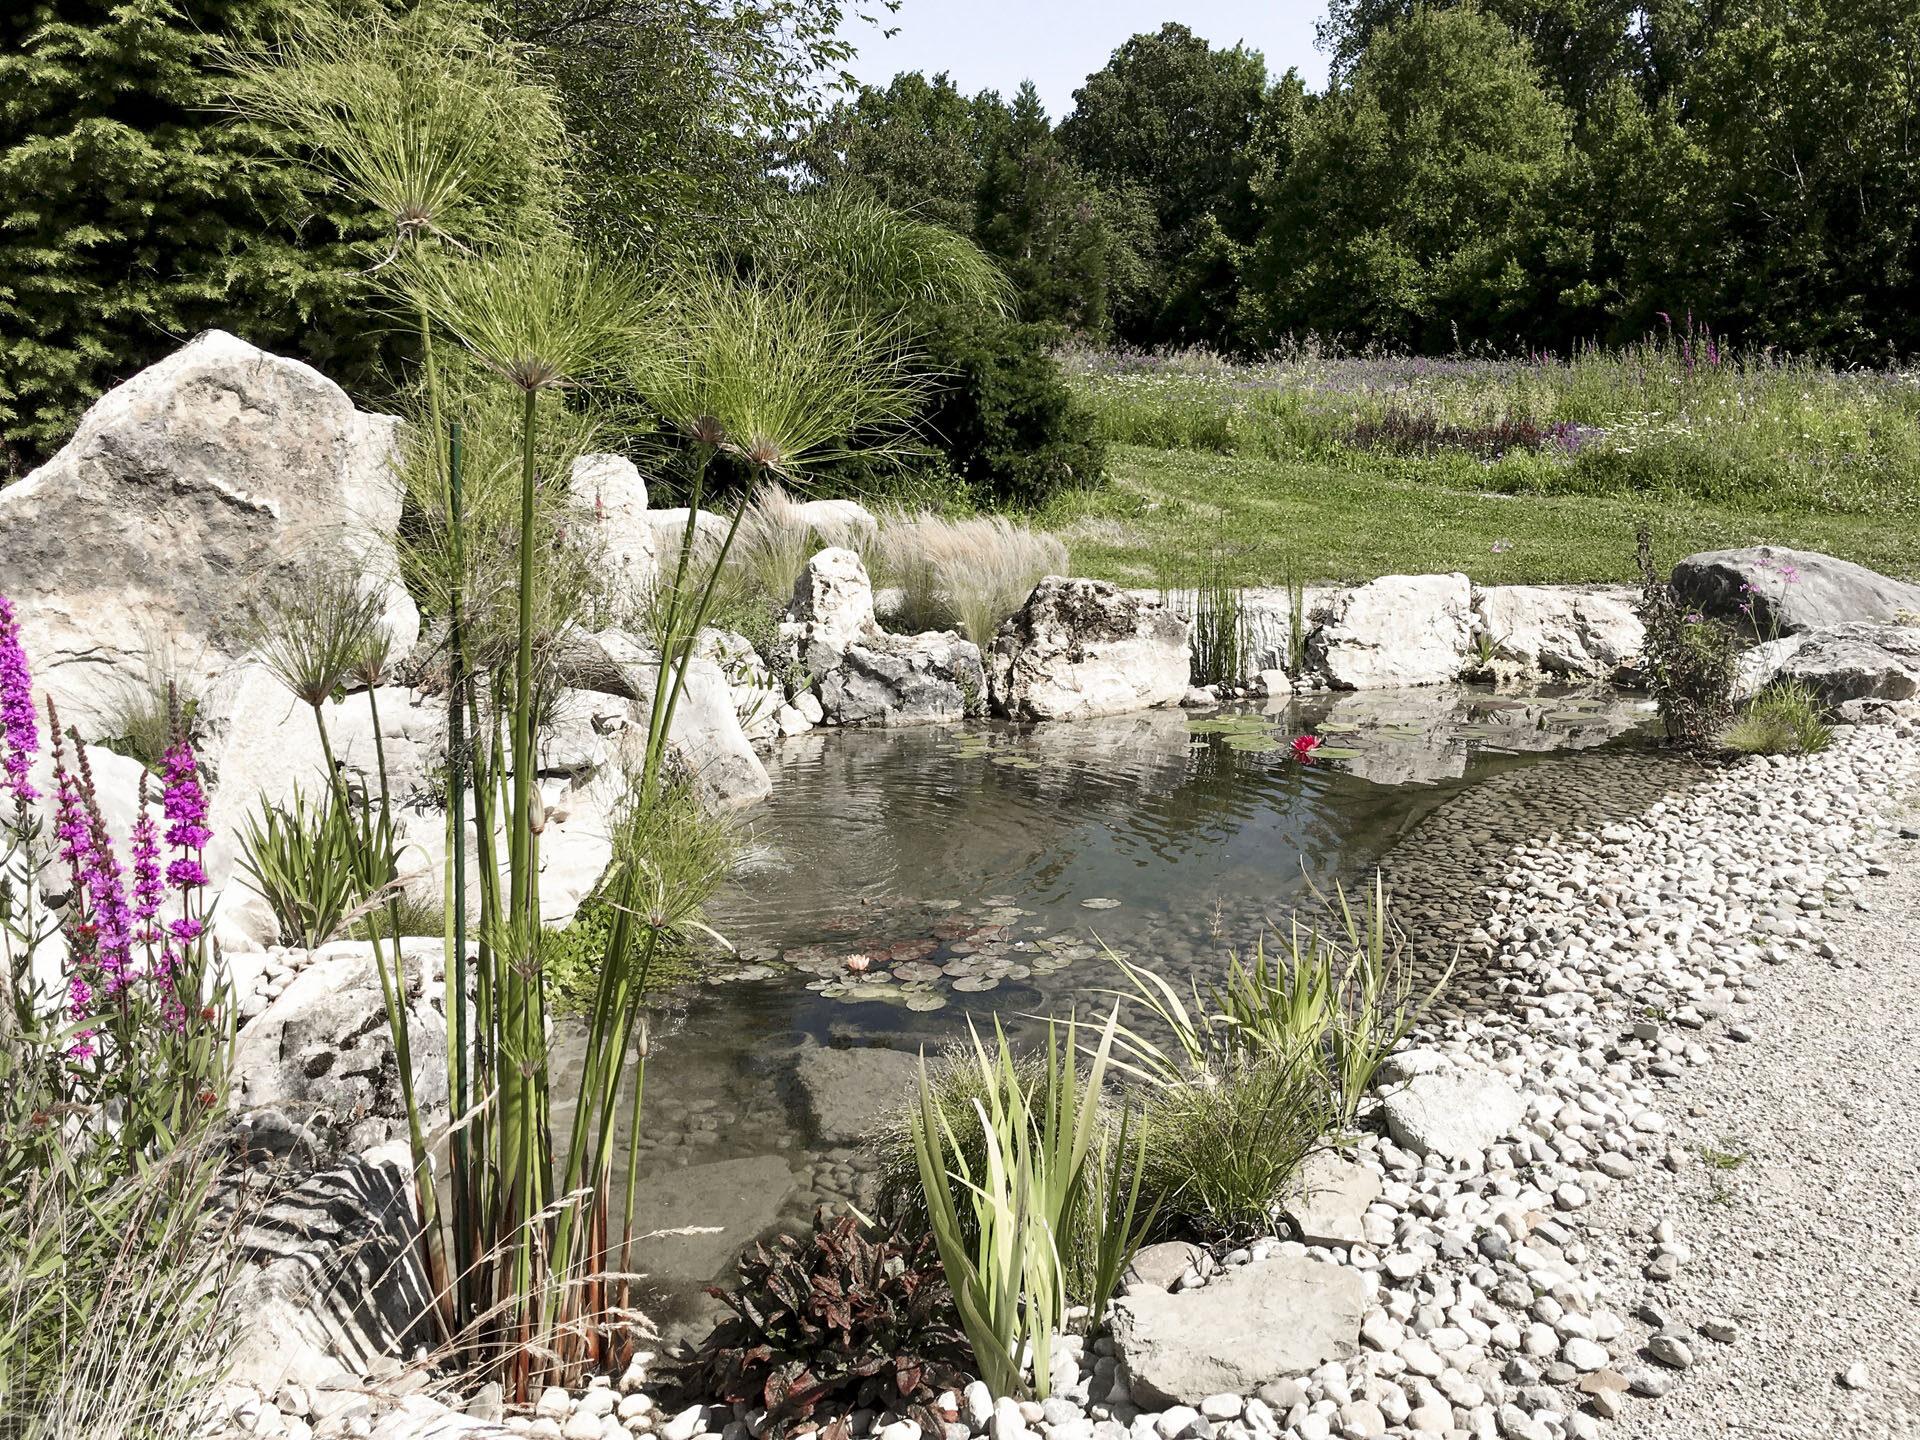 CSDK Bassin de jardin 3 1920x1440 - Engagement durable - CSDK Bassin de jardin 3 1920x1440